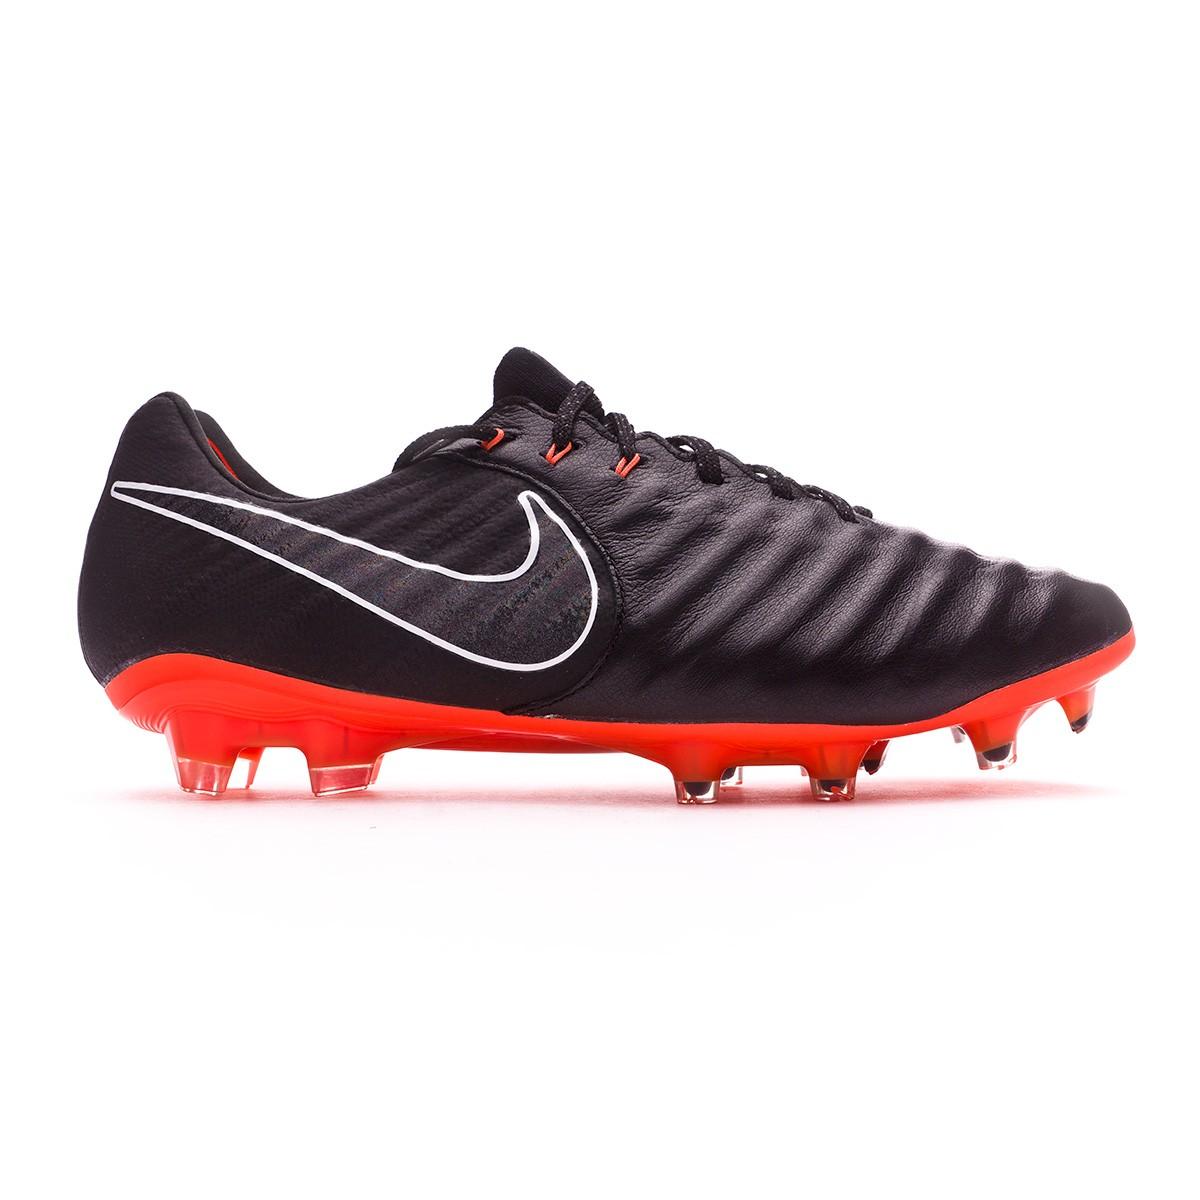 b53eddf77e2d Football Boots Nike Tiempo Legend VII Elite FG Black-Total orange-White - Football  store Fútbol Emotion